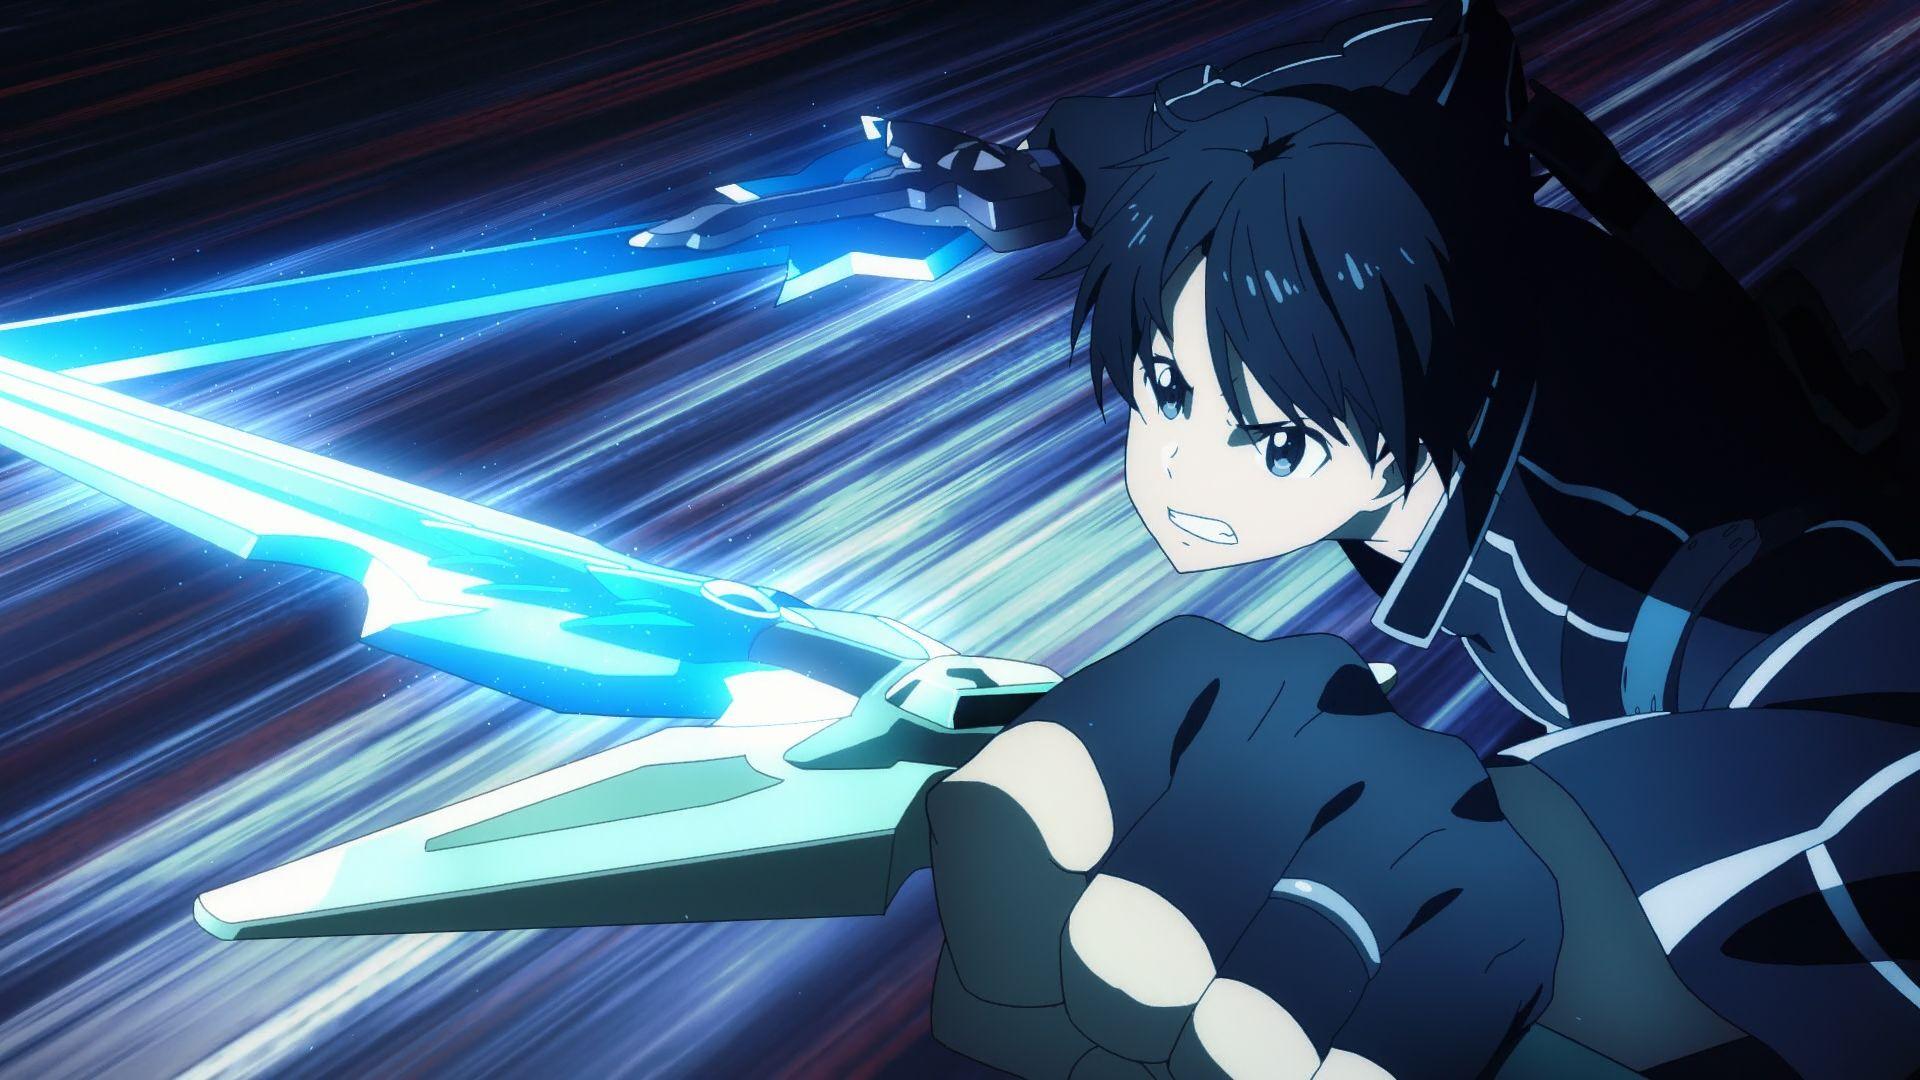 Wallpaper Sword Art Online Kirito Sword Art Online Kirigaya